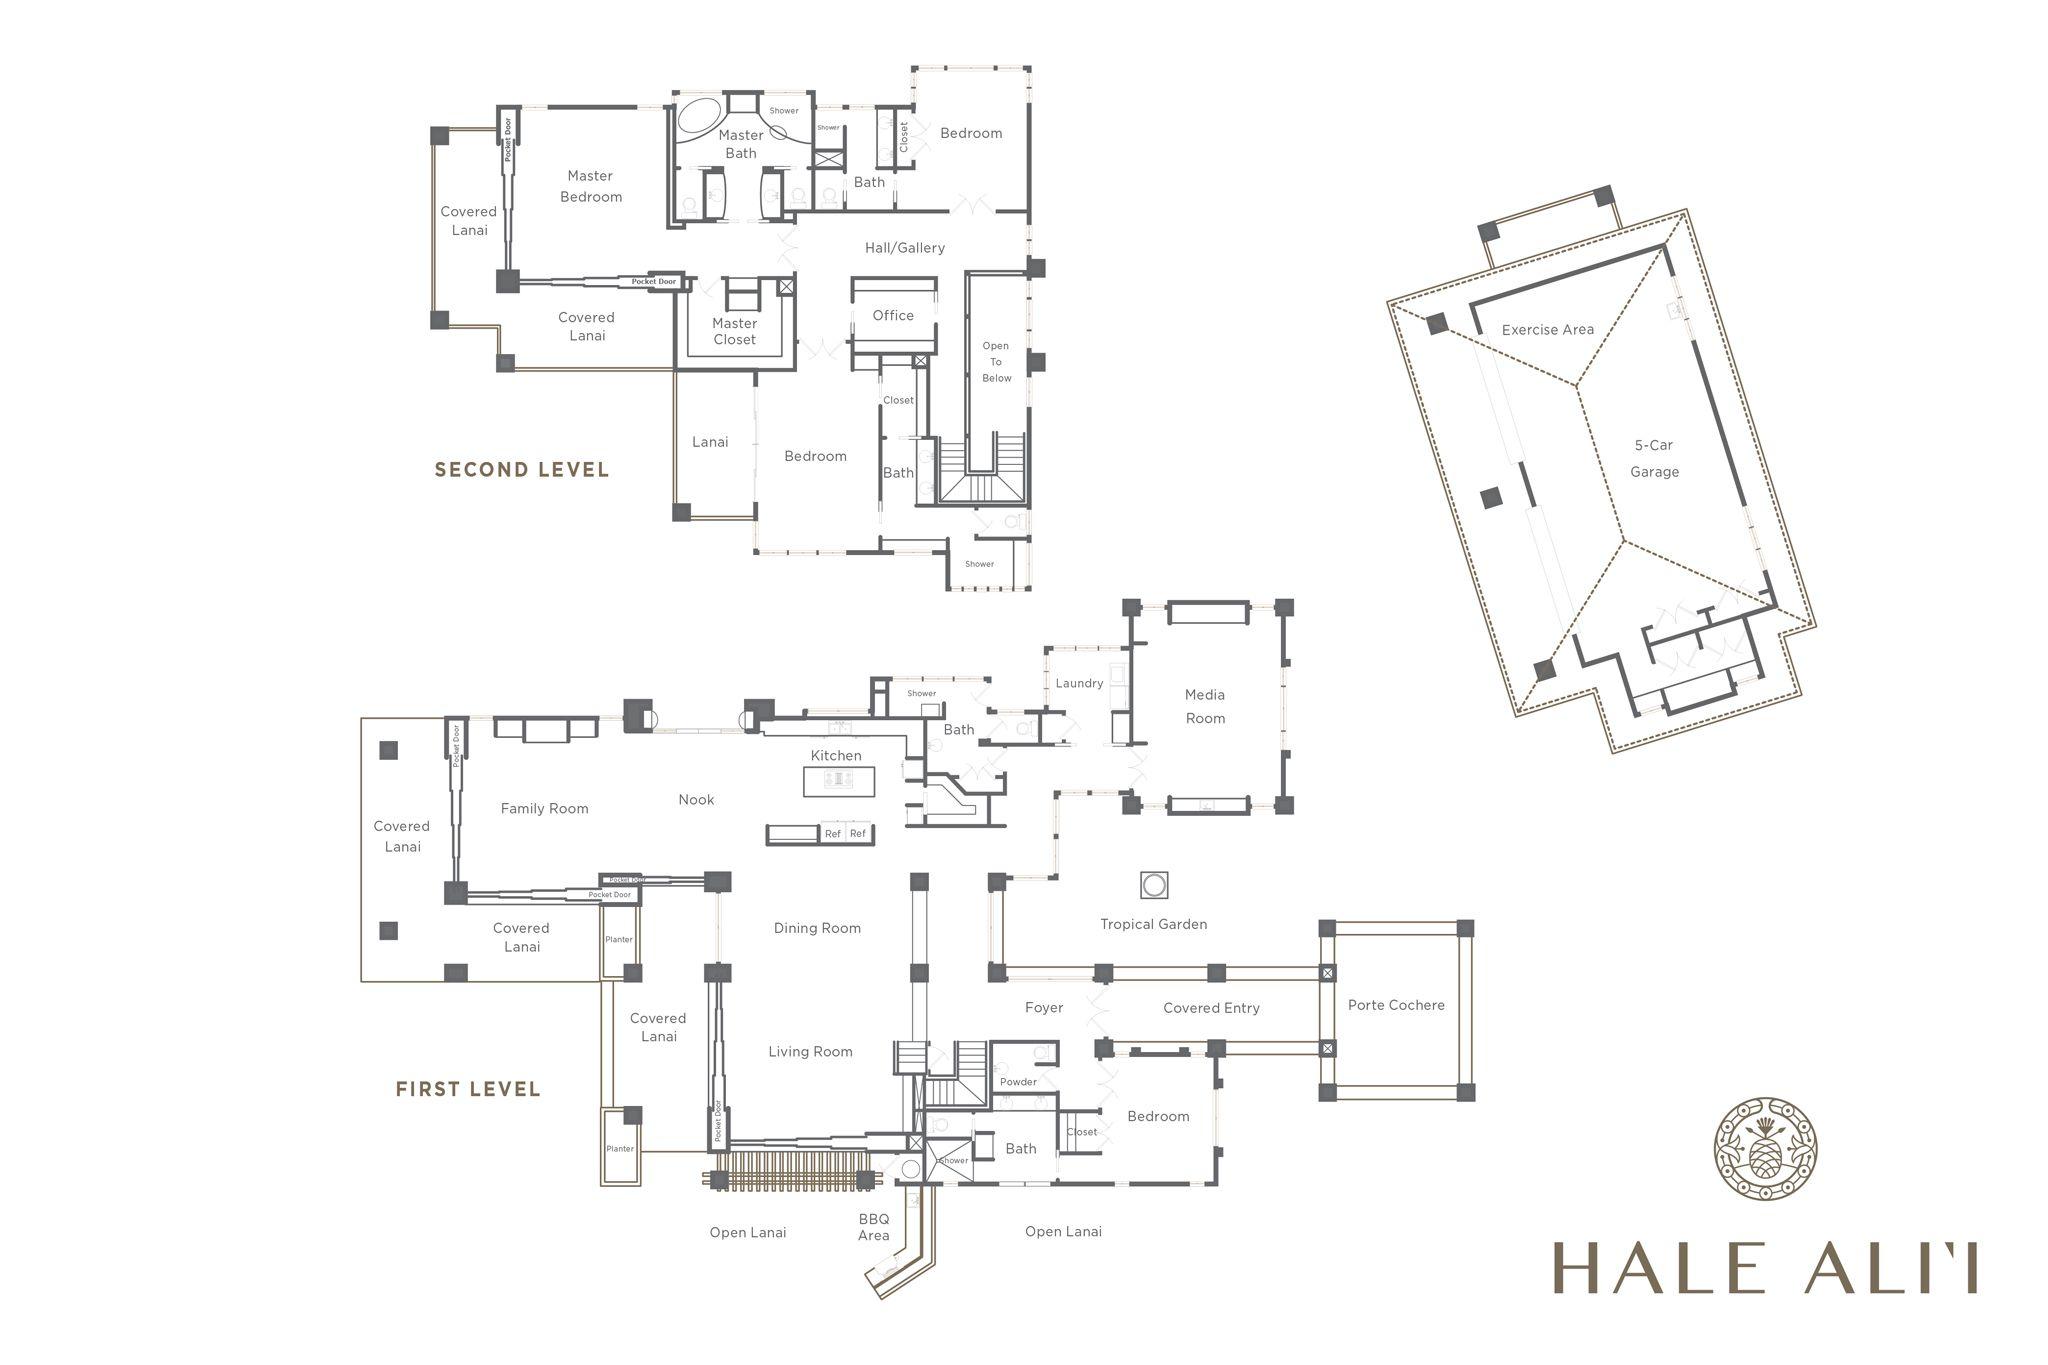 9 Kapalua, Maui Floor plans, Floor plan design, Custom homes